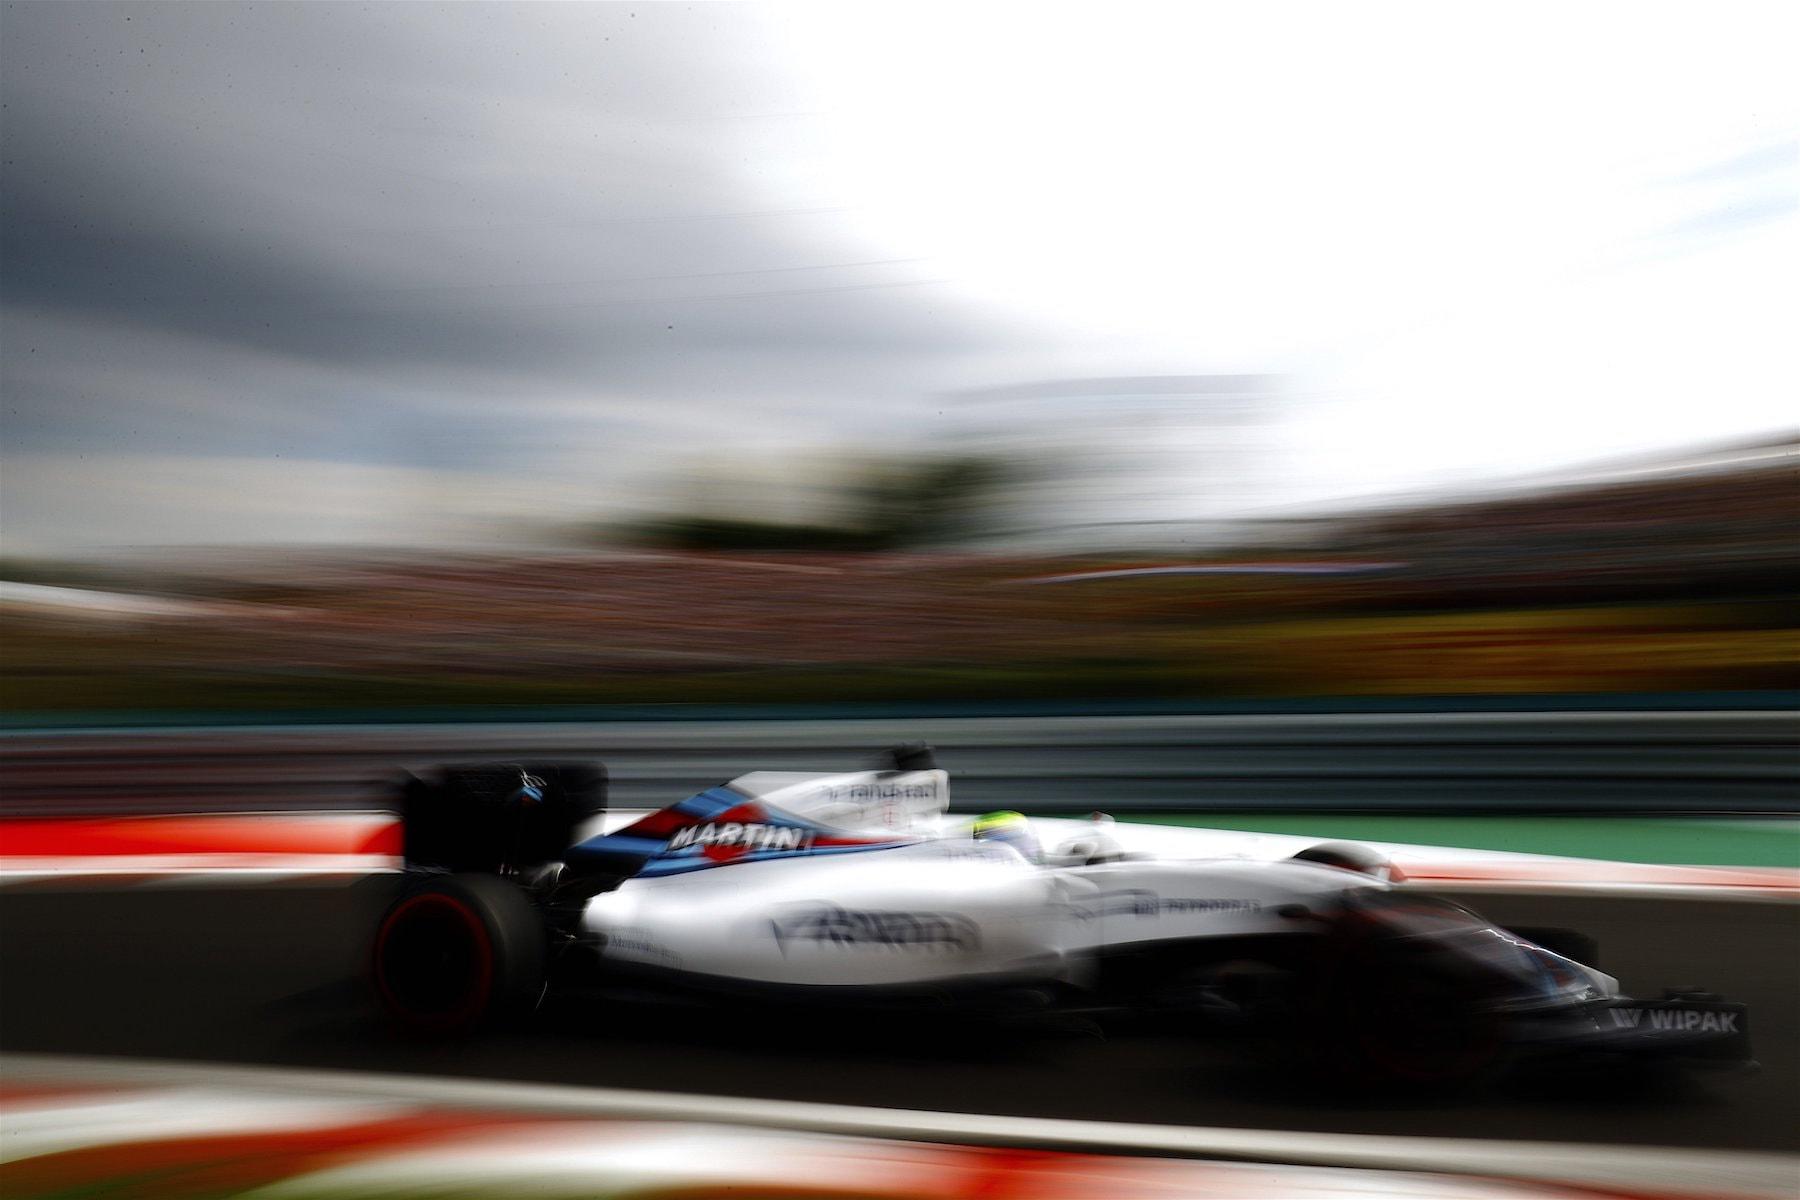 Salracing | Felipe Massa | Williams Martini Racing